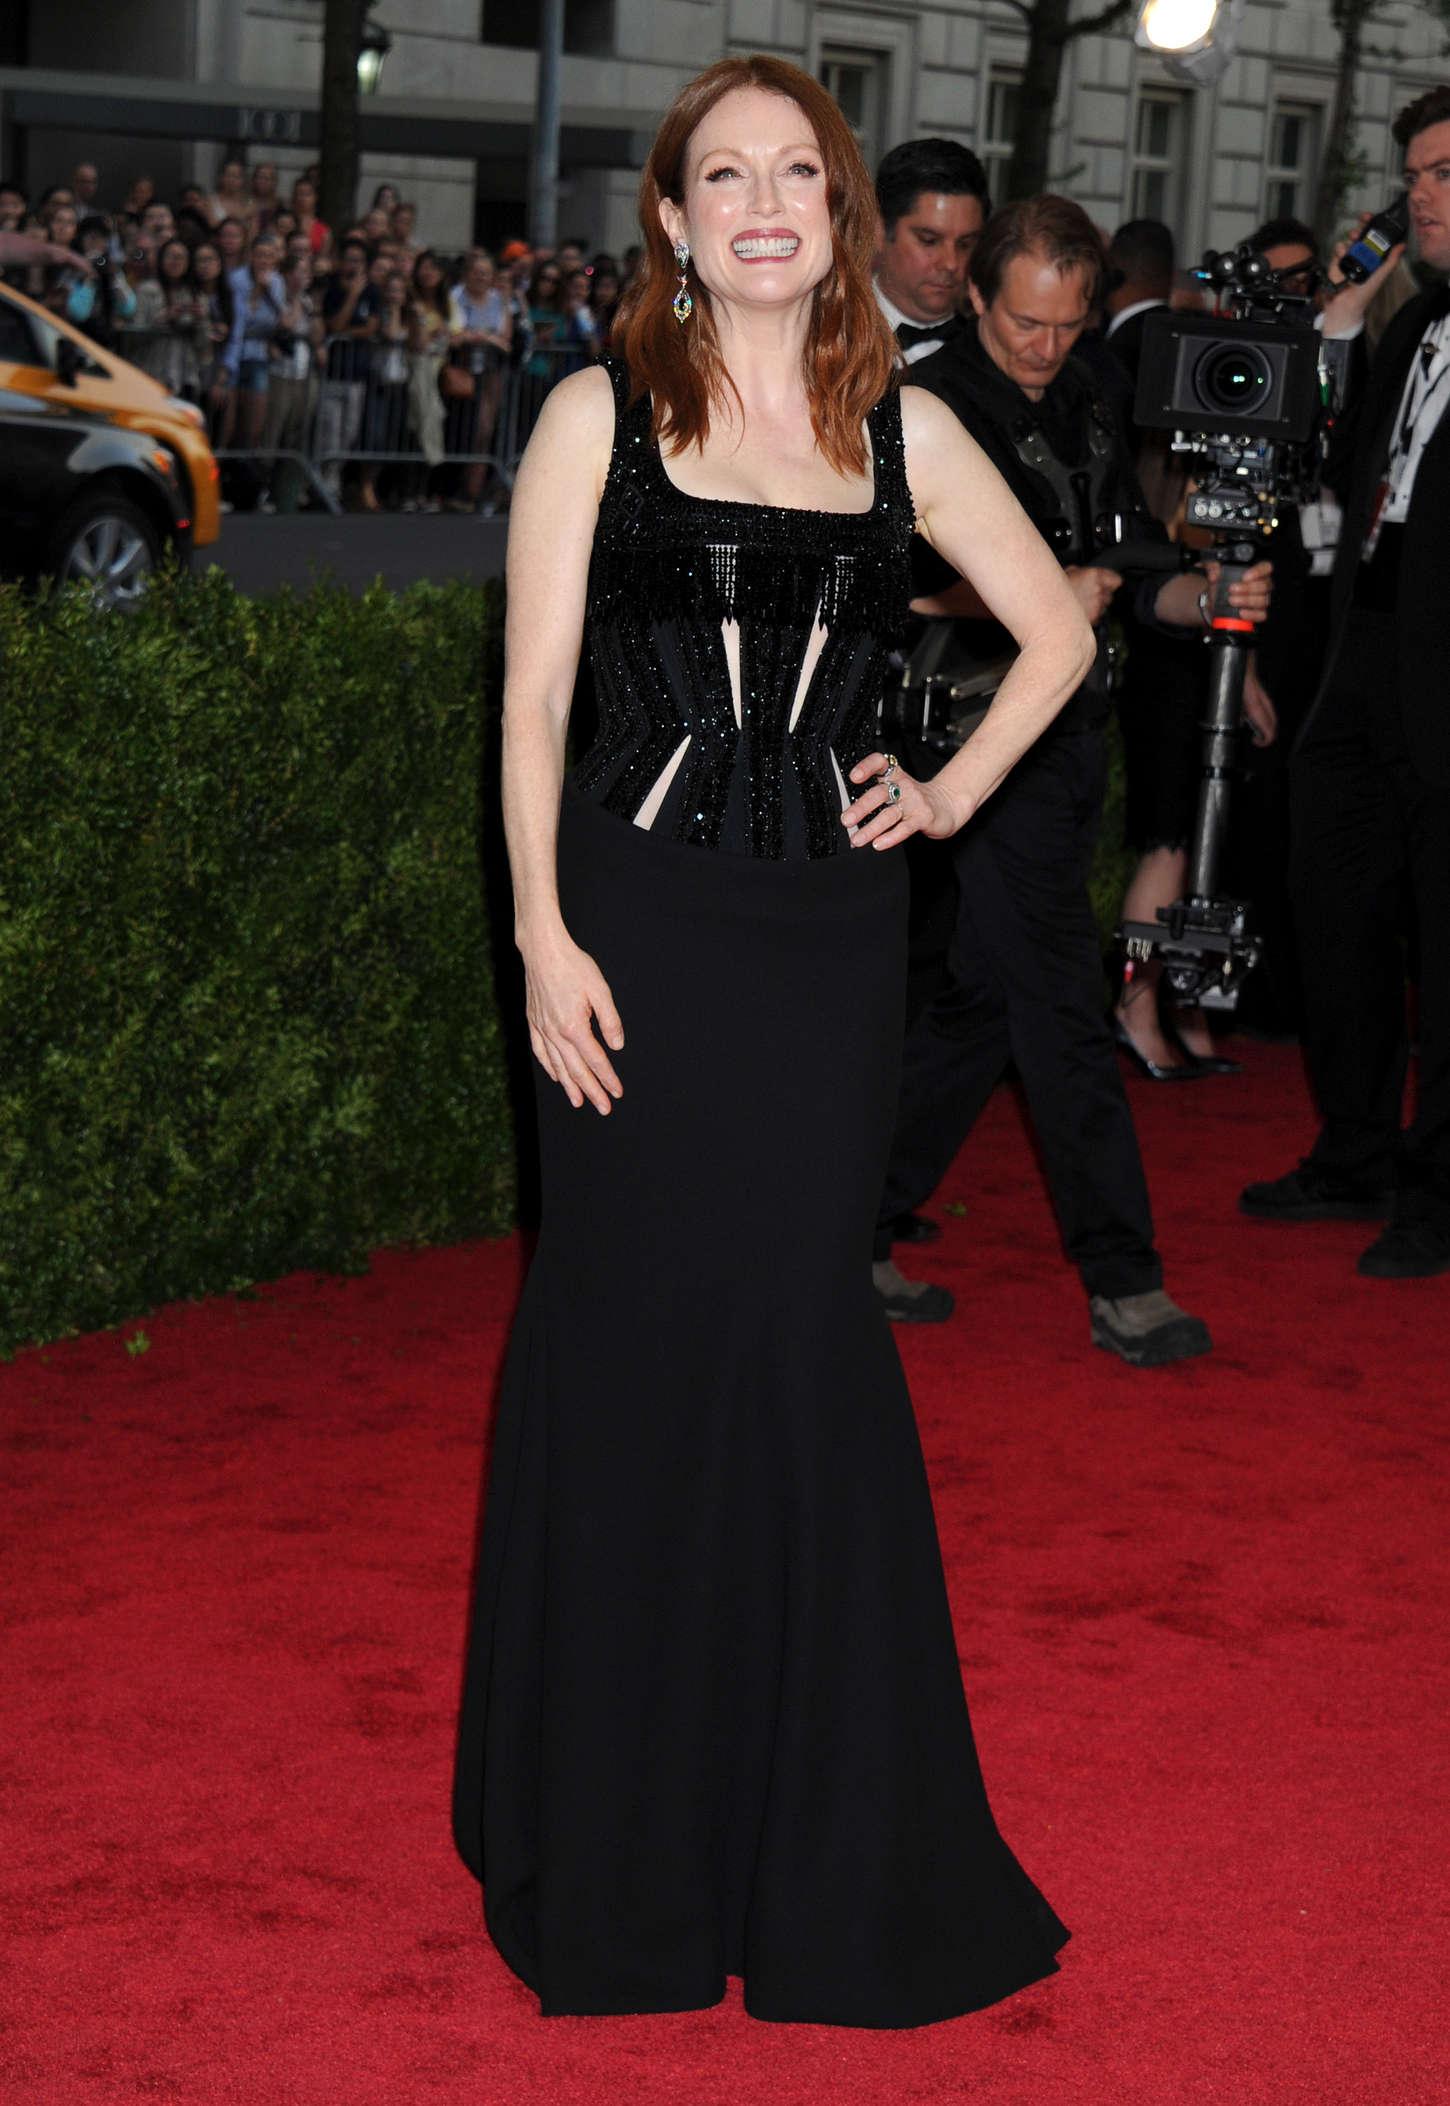 Julianne Moore - 2015 Costume Institute Gala in NYC